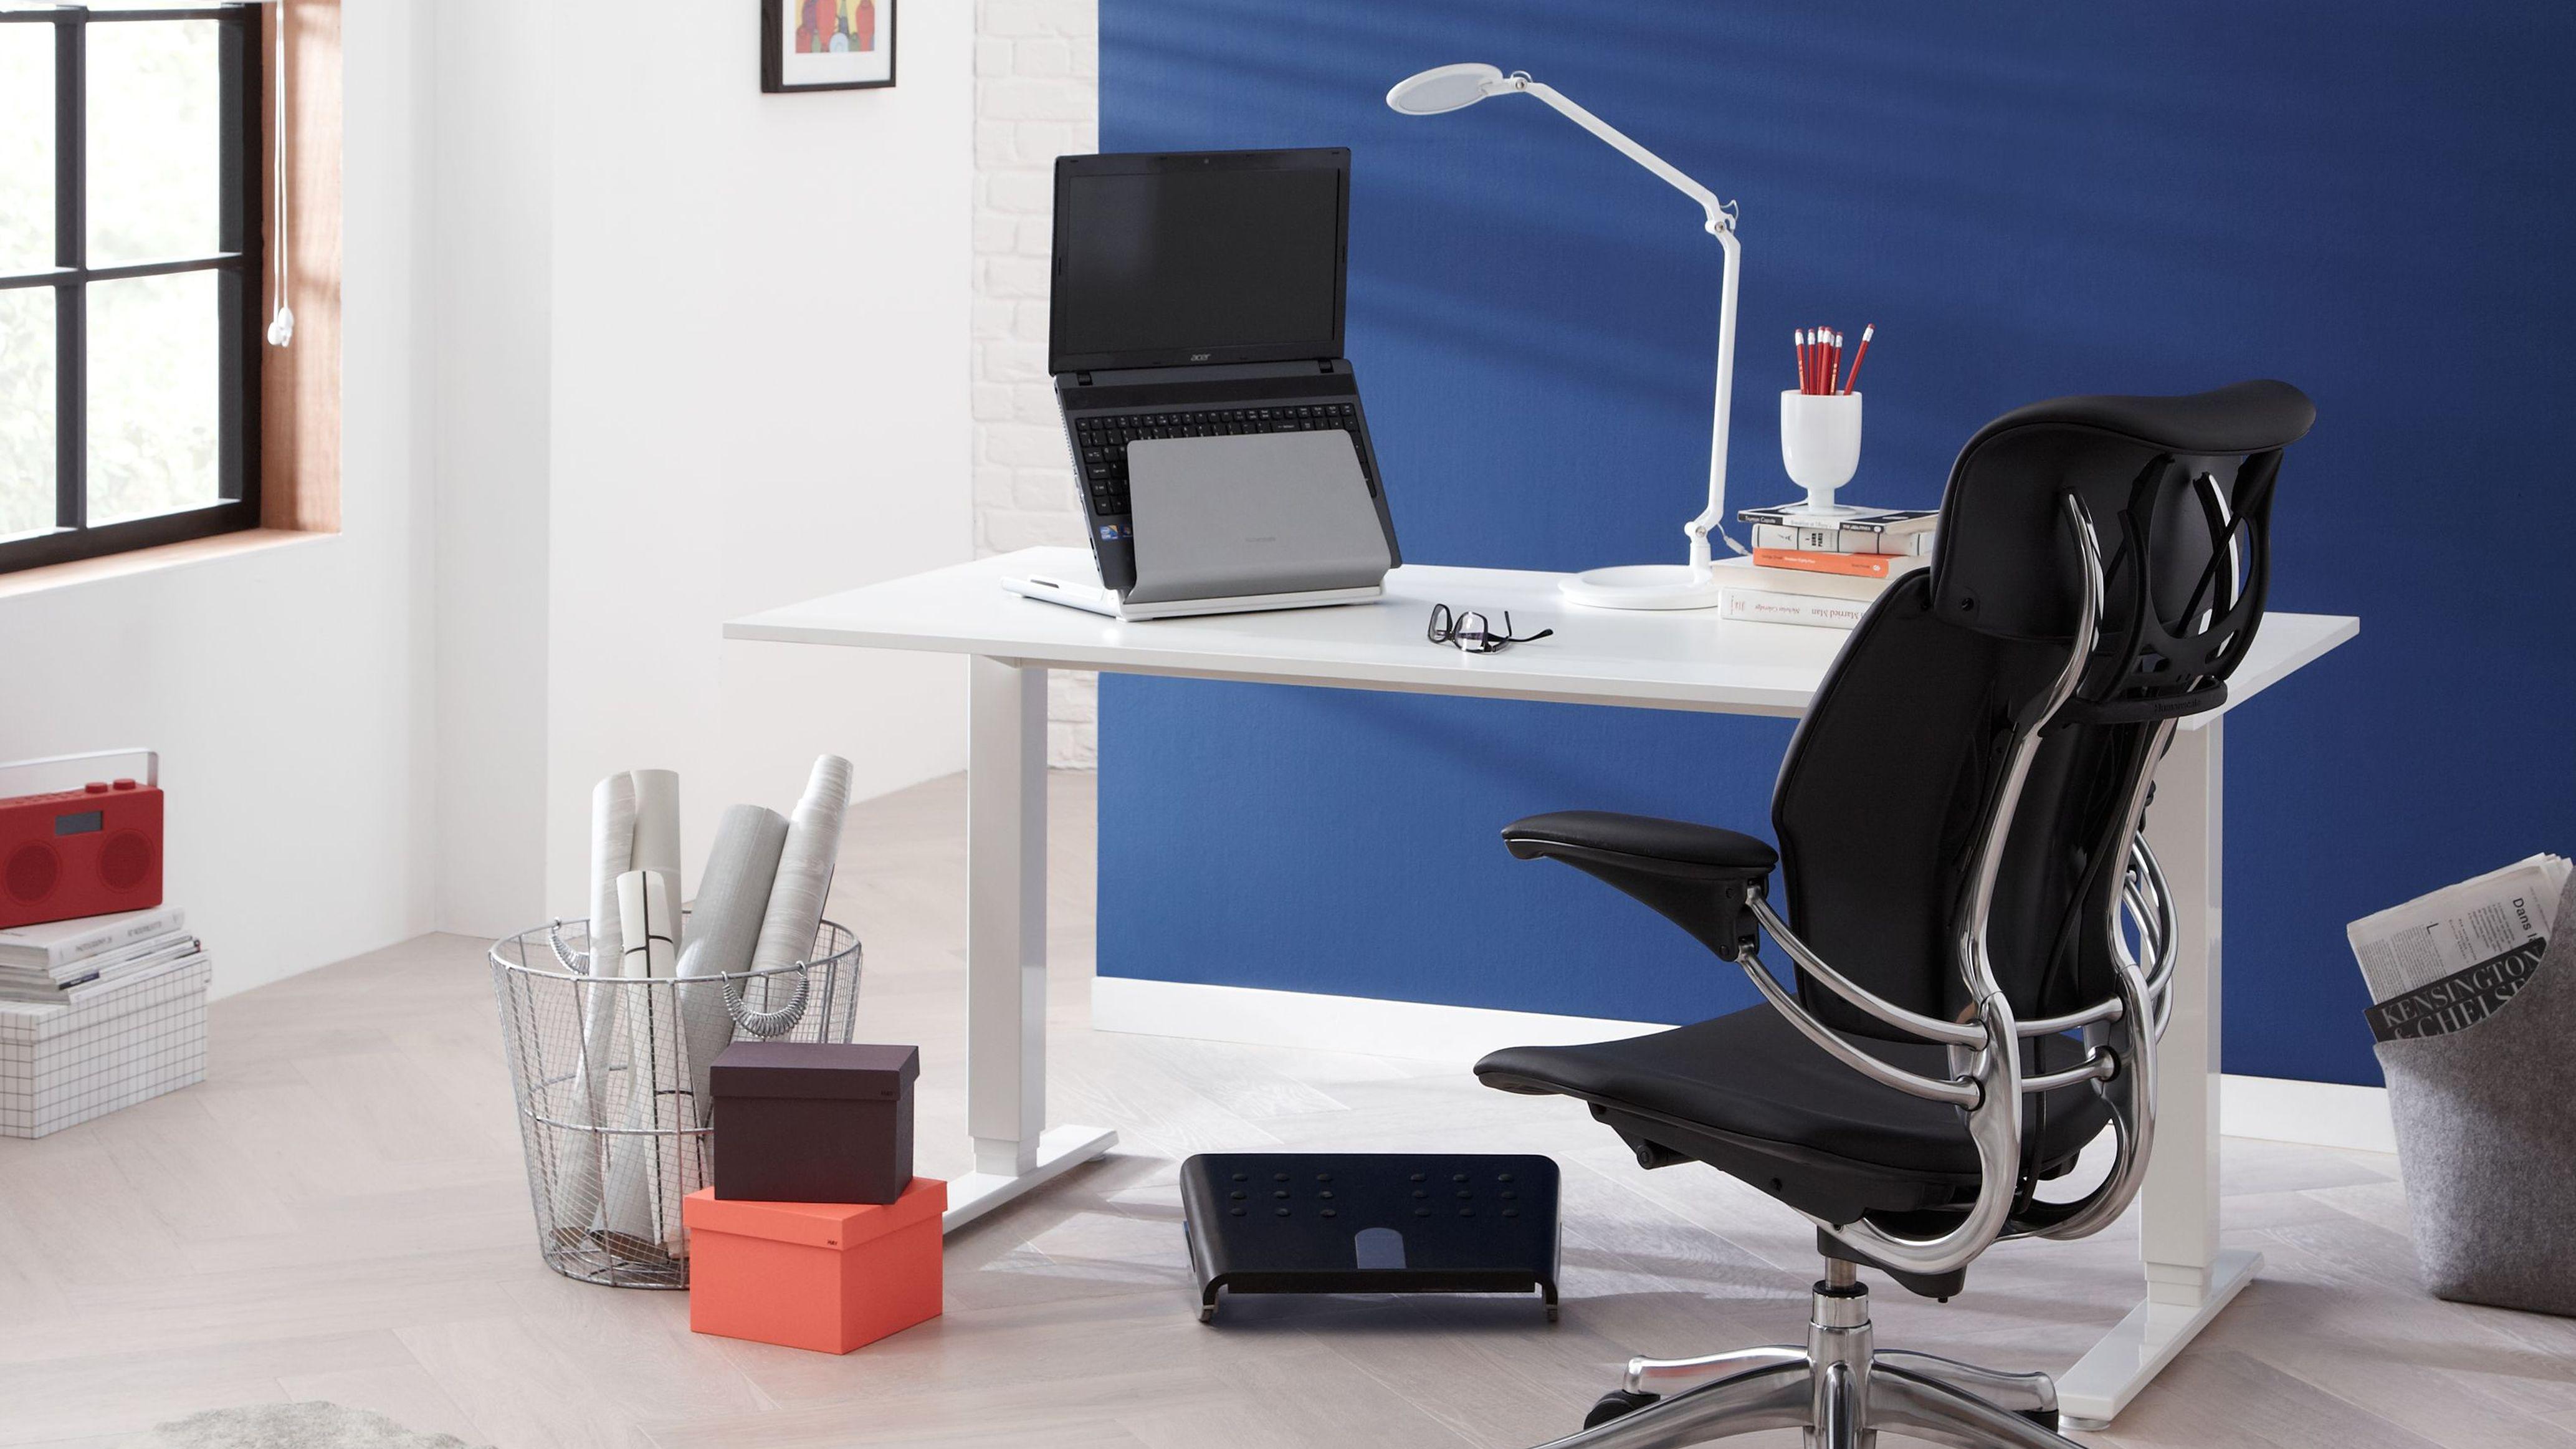 Best laptop stands: 5 adjustable laptop stands for